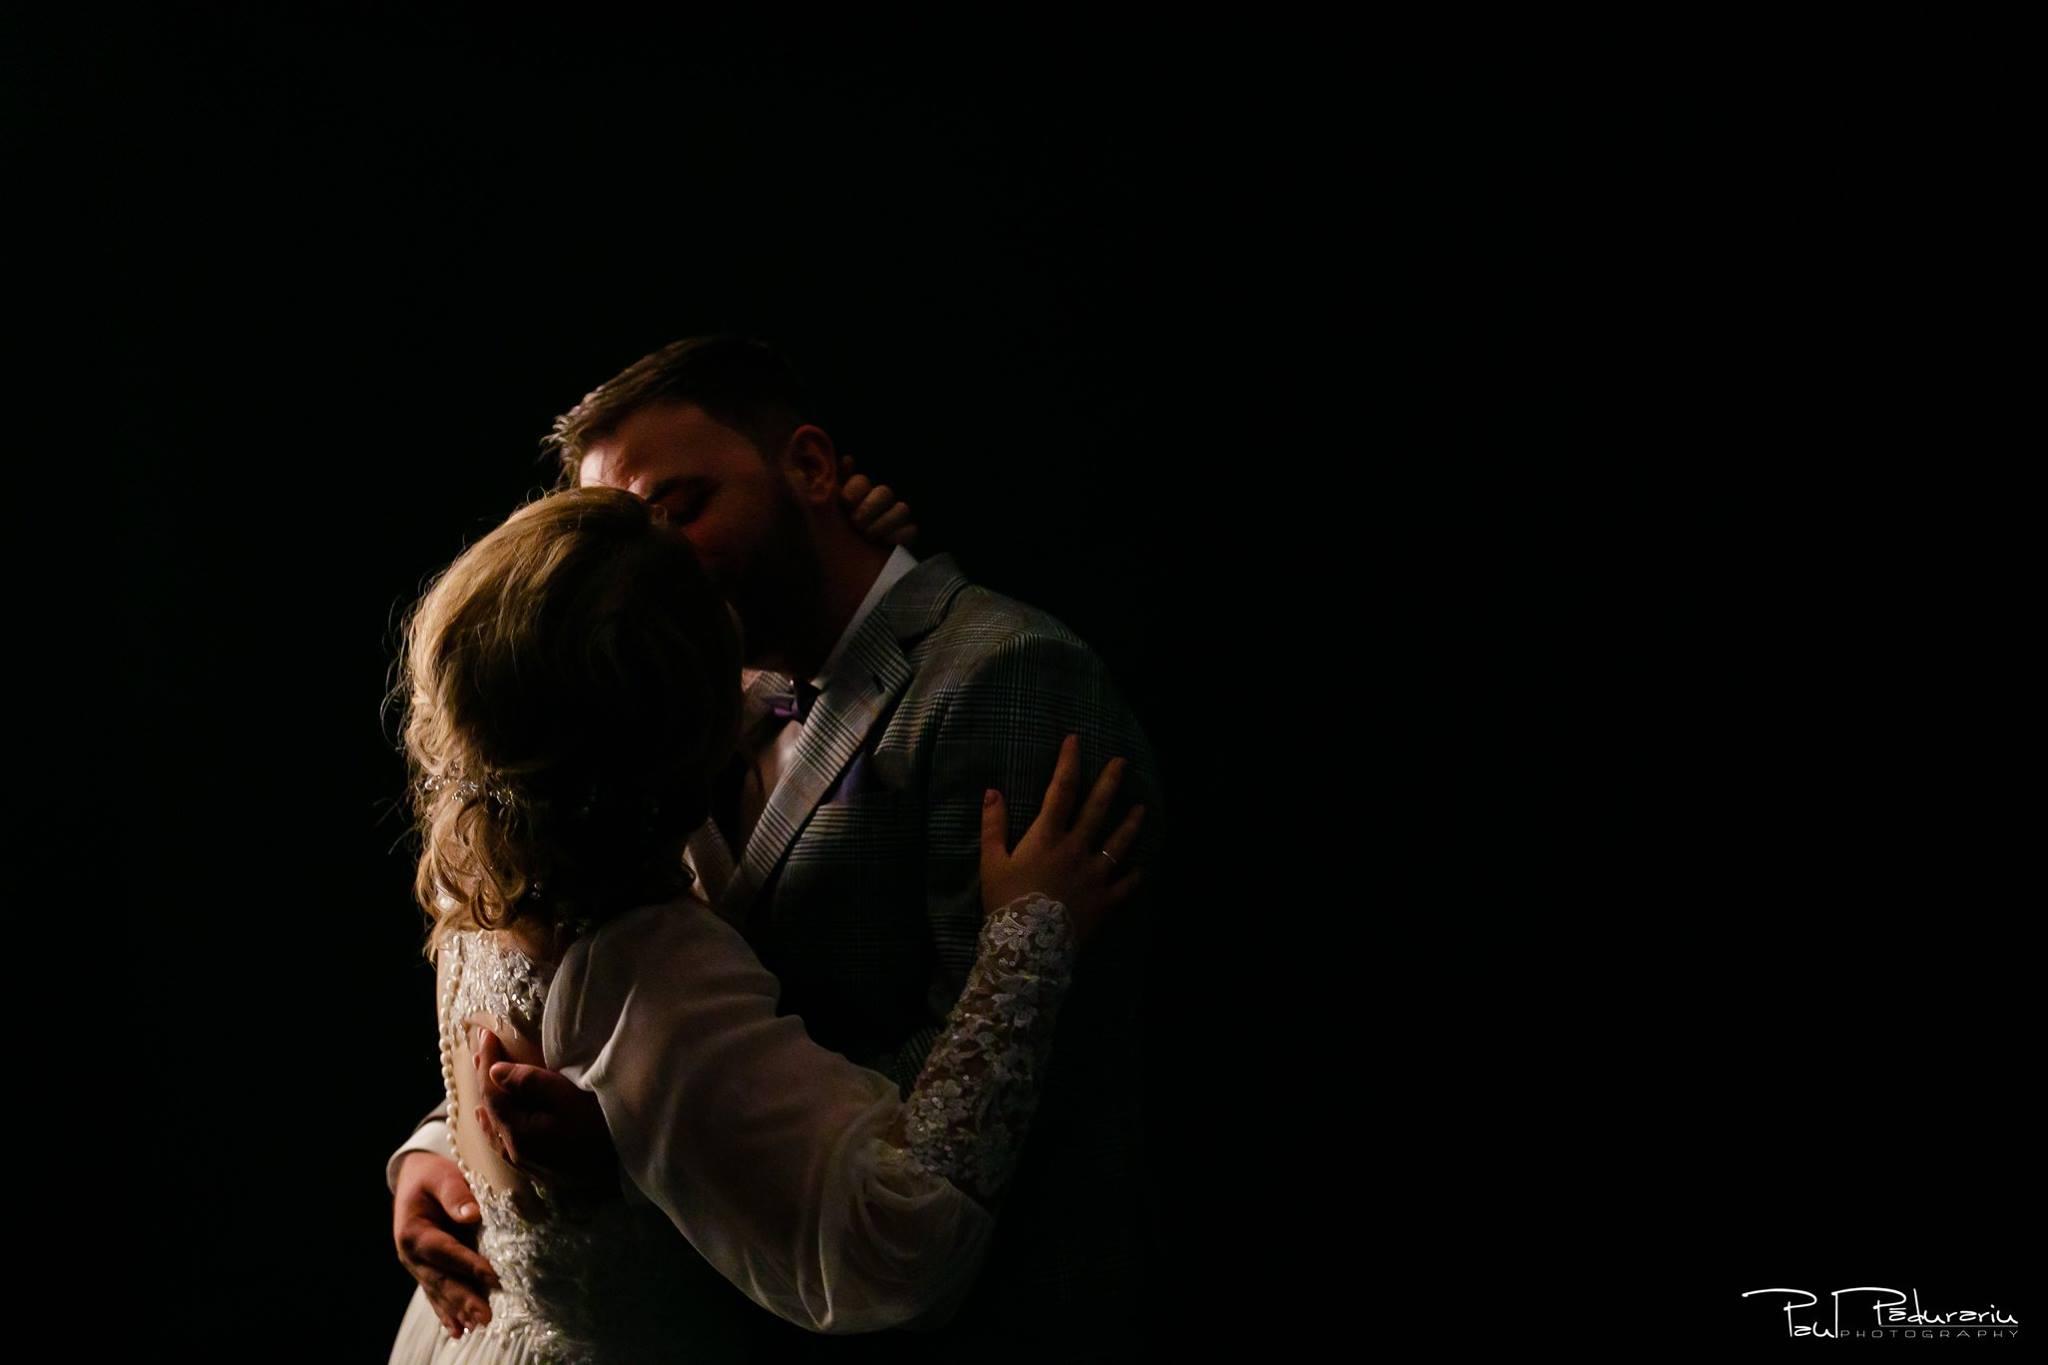 Adriana si Ionut sedinta foto nunta iasi fotograf profesionist paul padurariu 2019 9